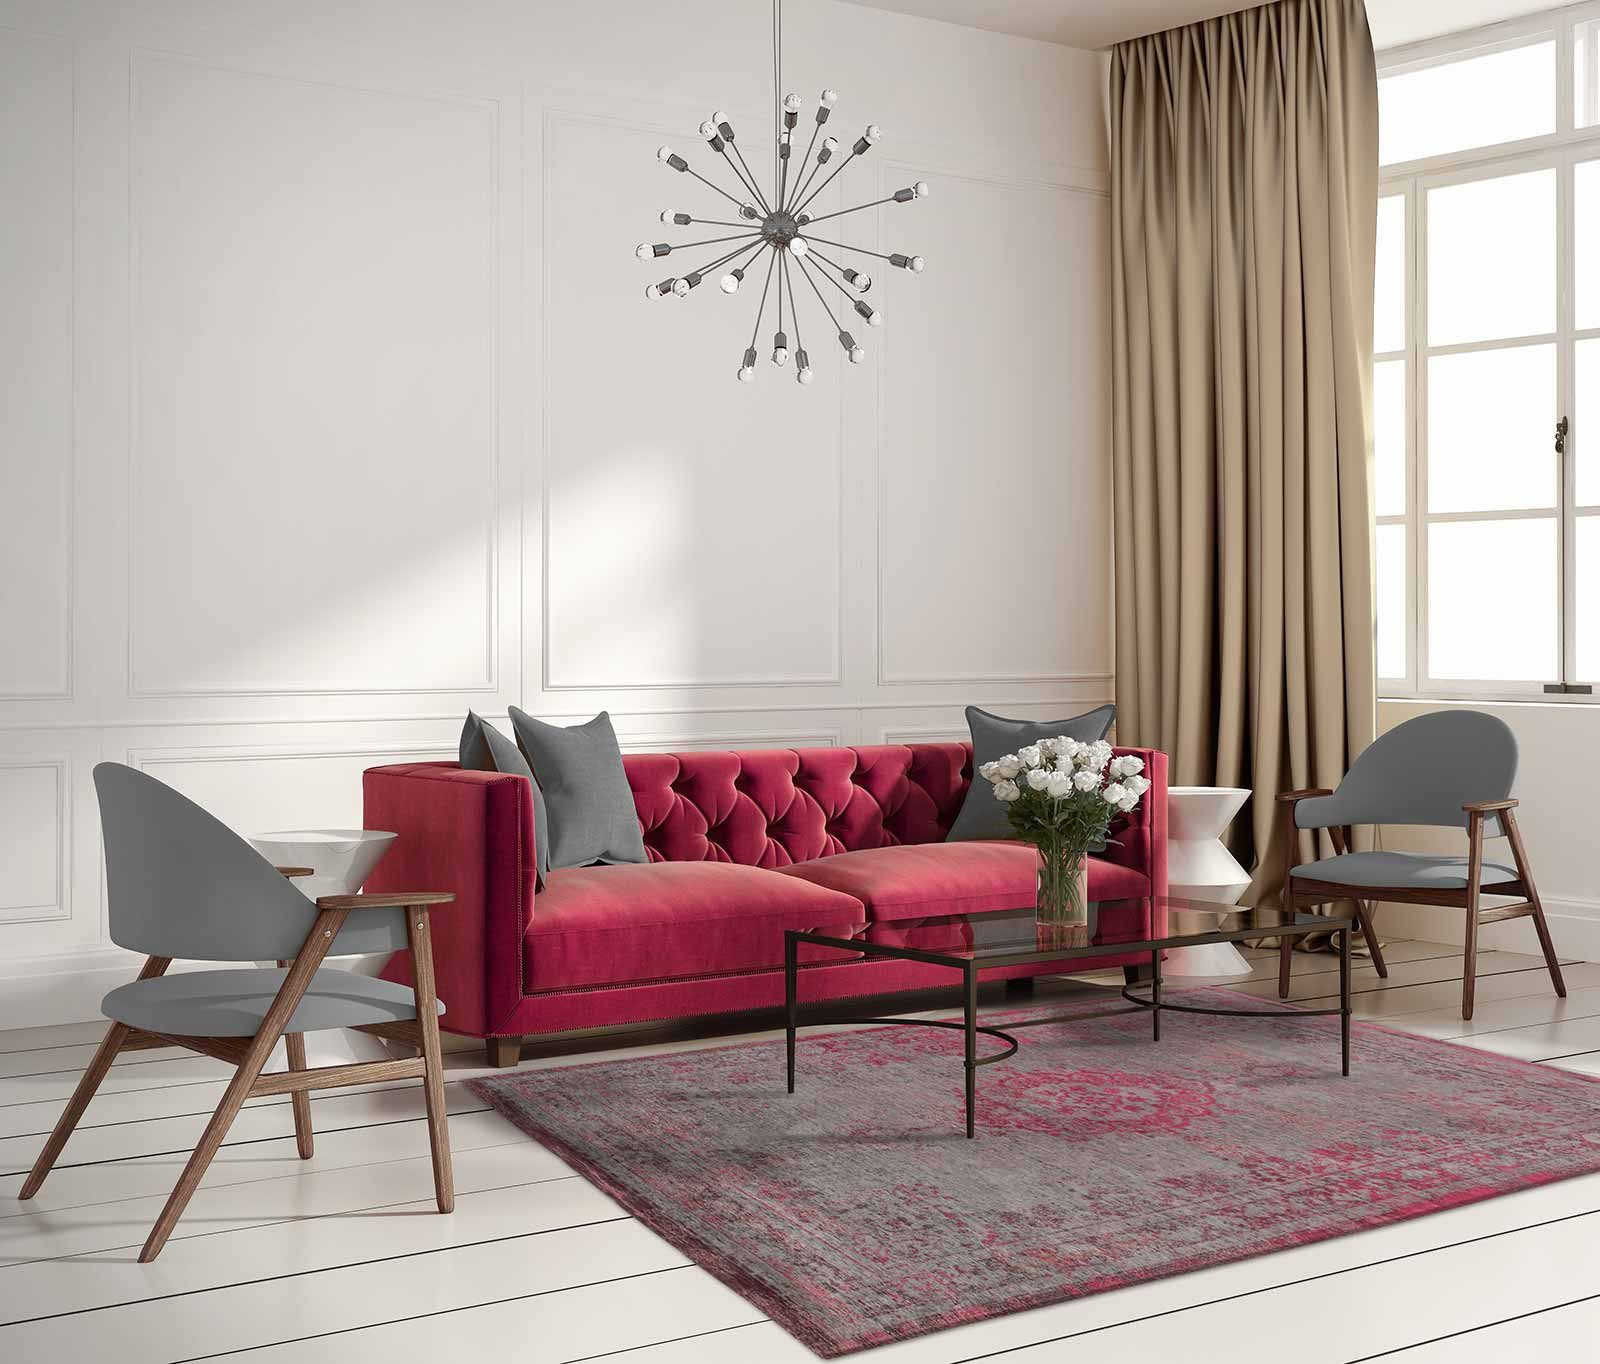 rug Louis De Poortere LX8261 Fading World Medaillon Pink Flash interior